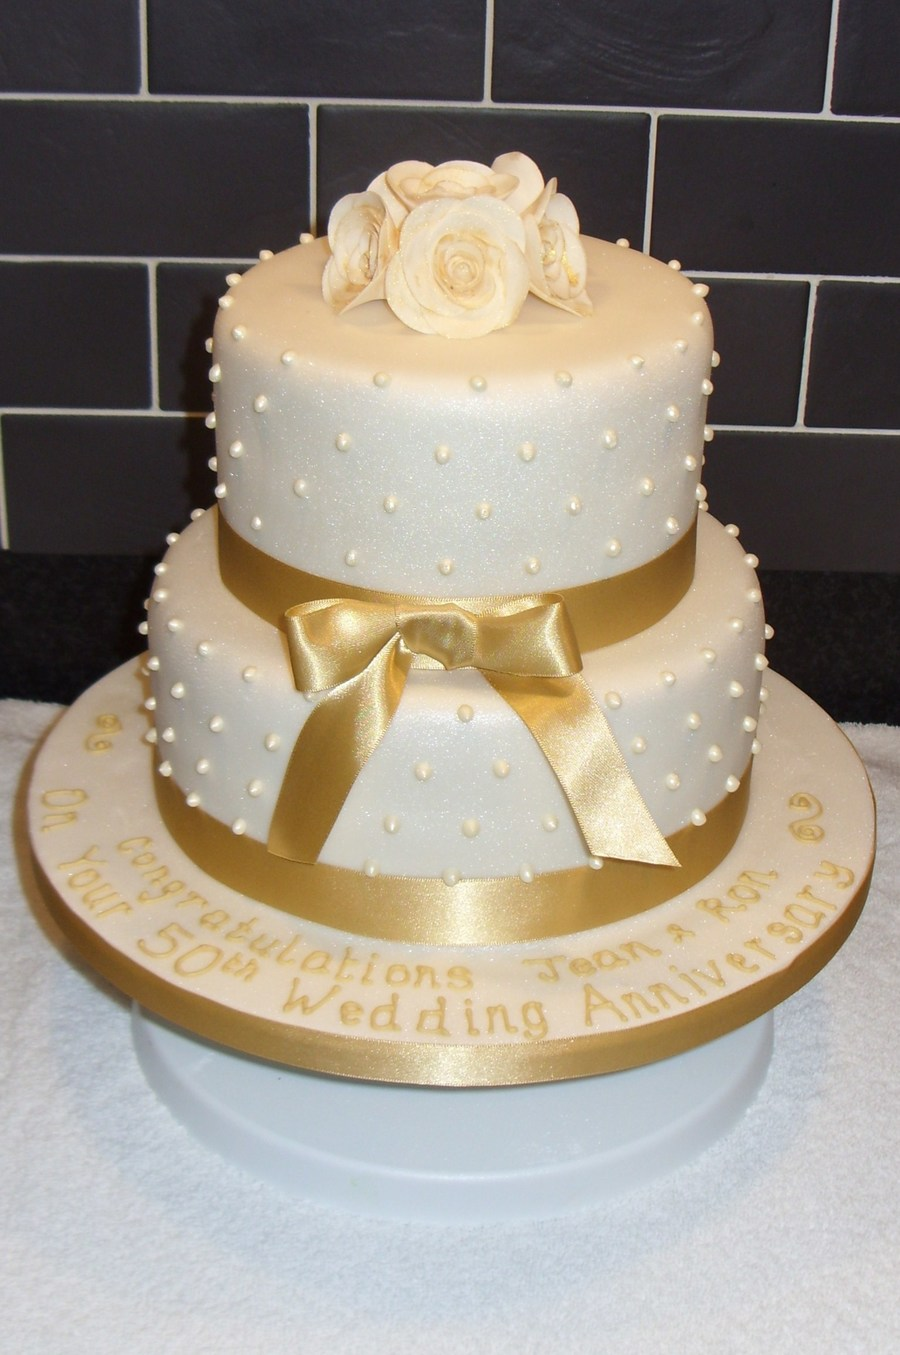 Golden Wedding Anniversary Cake - CakeCentral.com